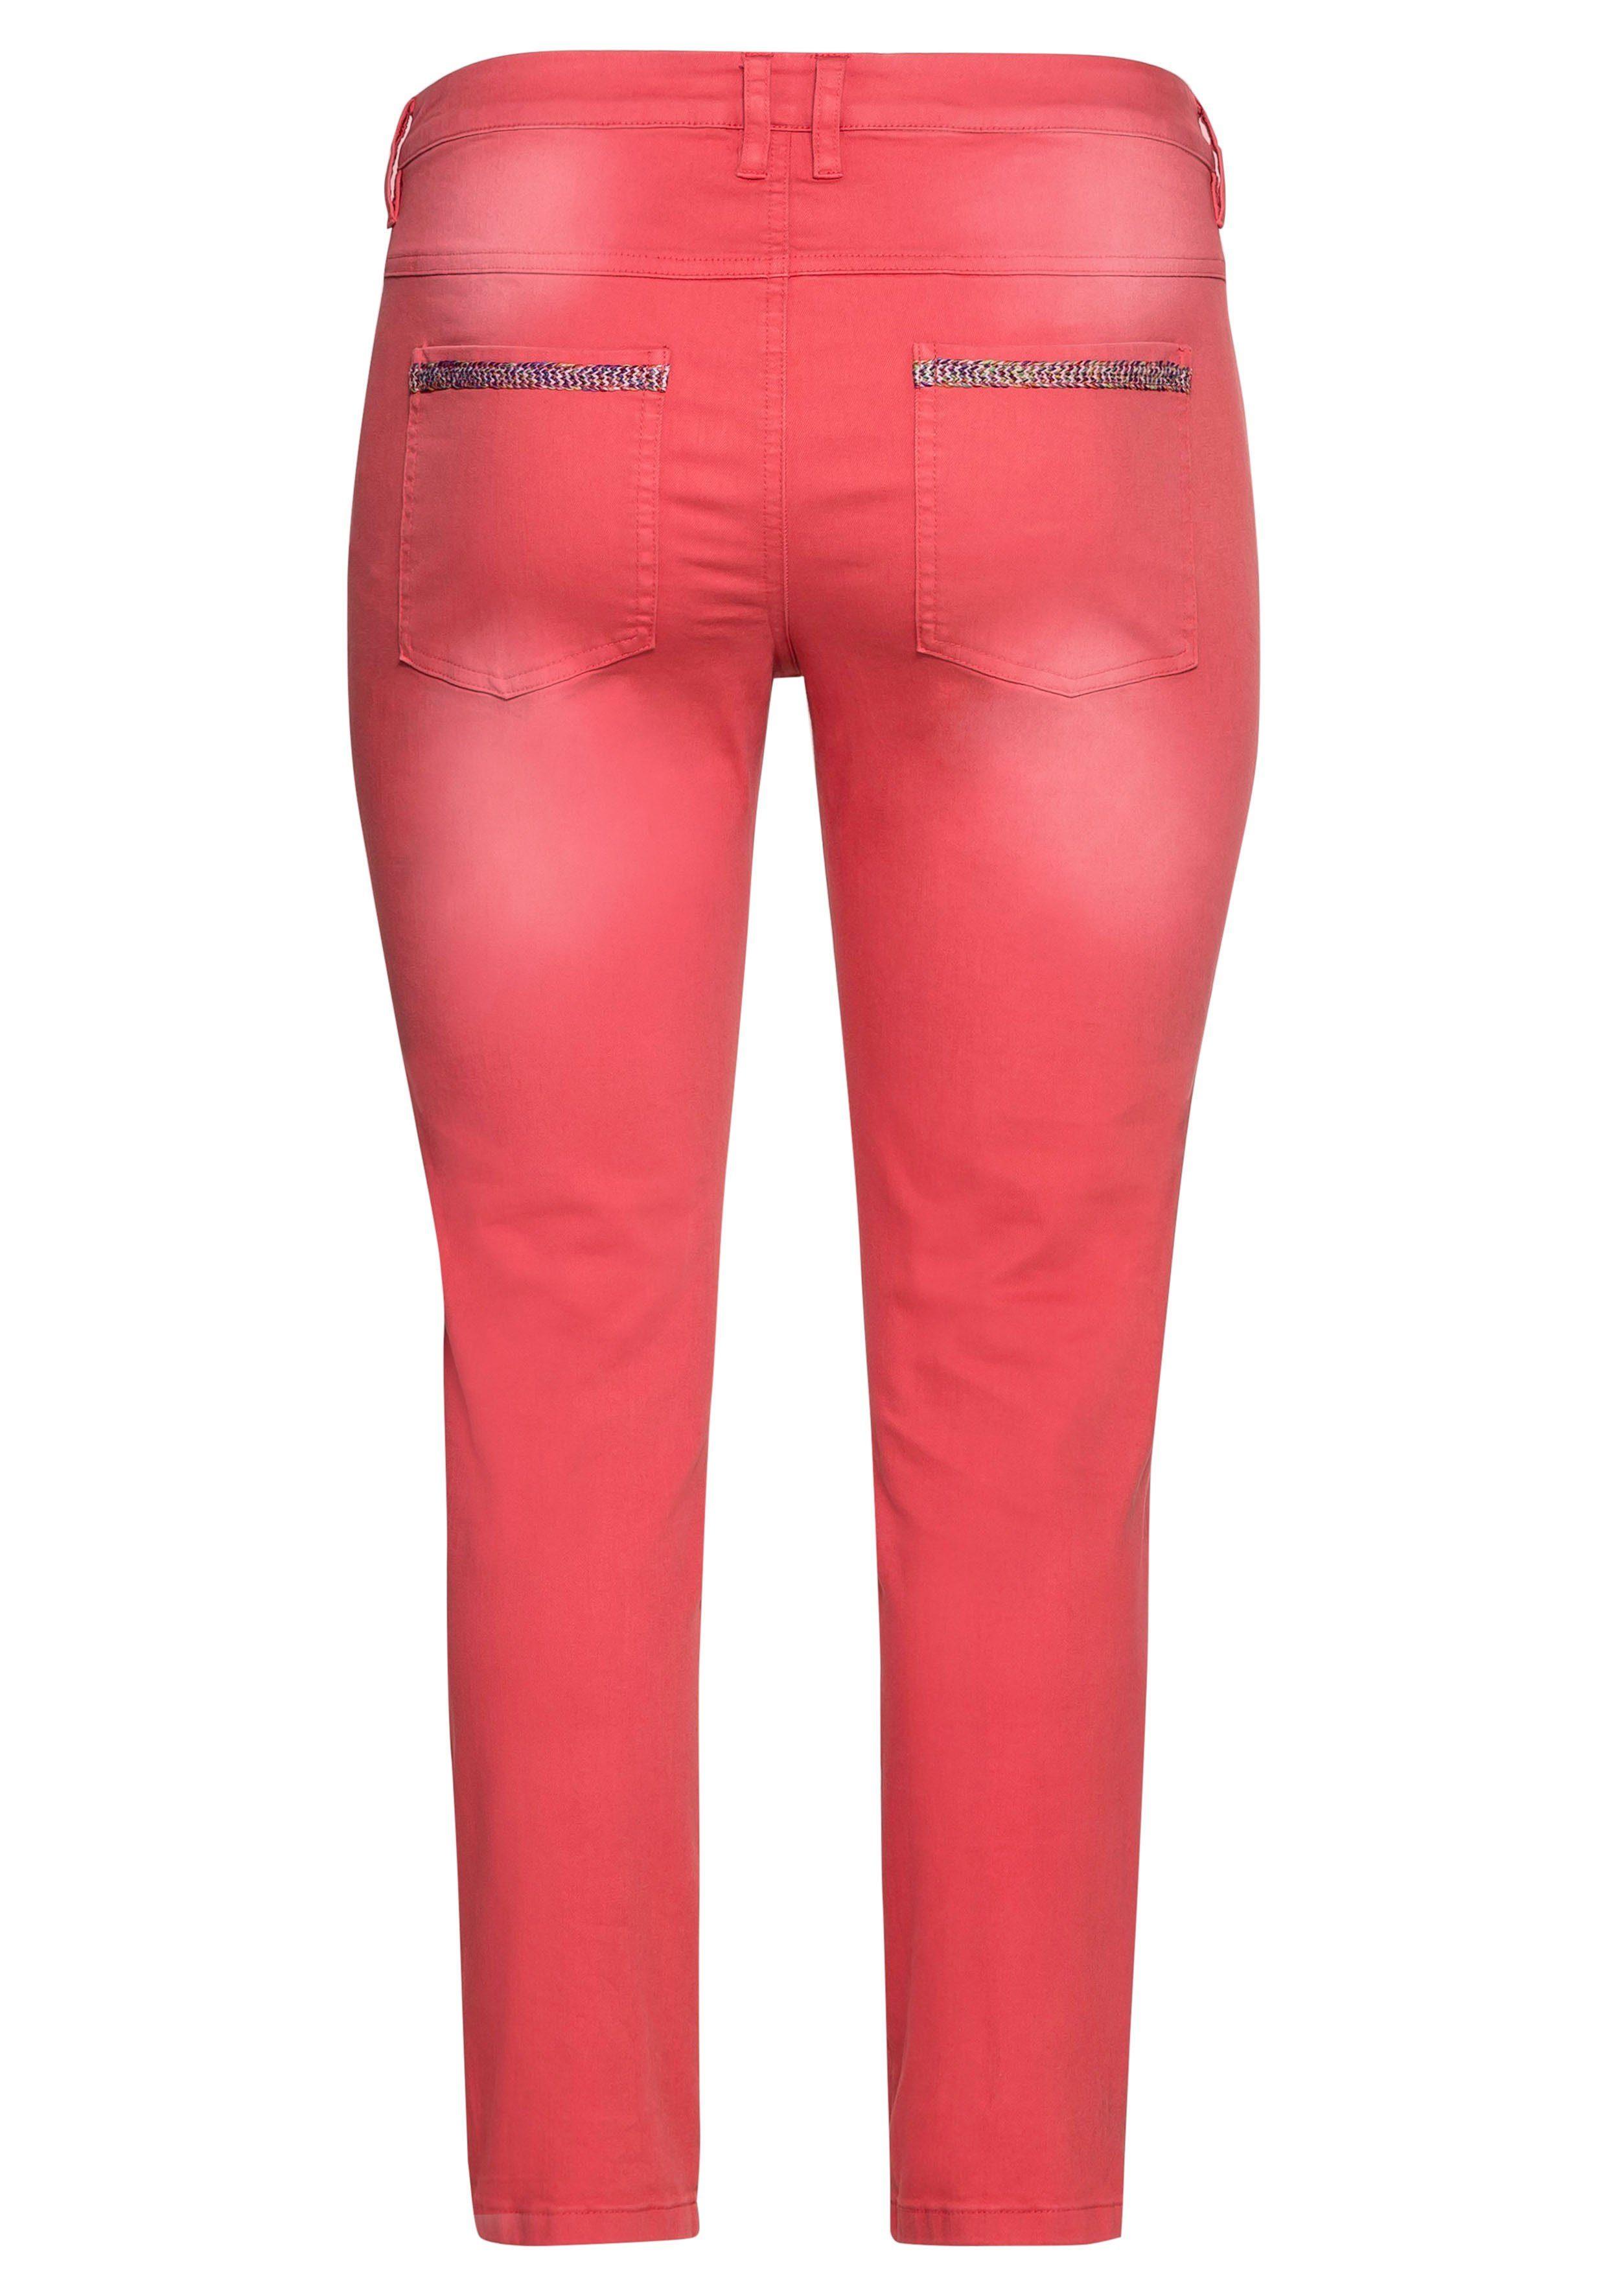 Sheego Stretch-Hose mit individueller Waschung